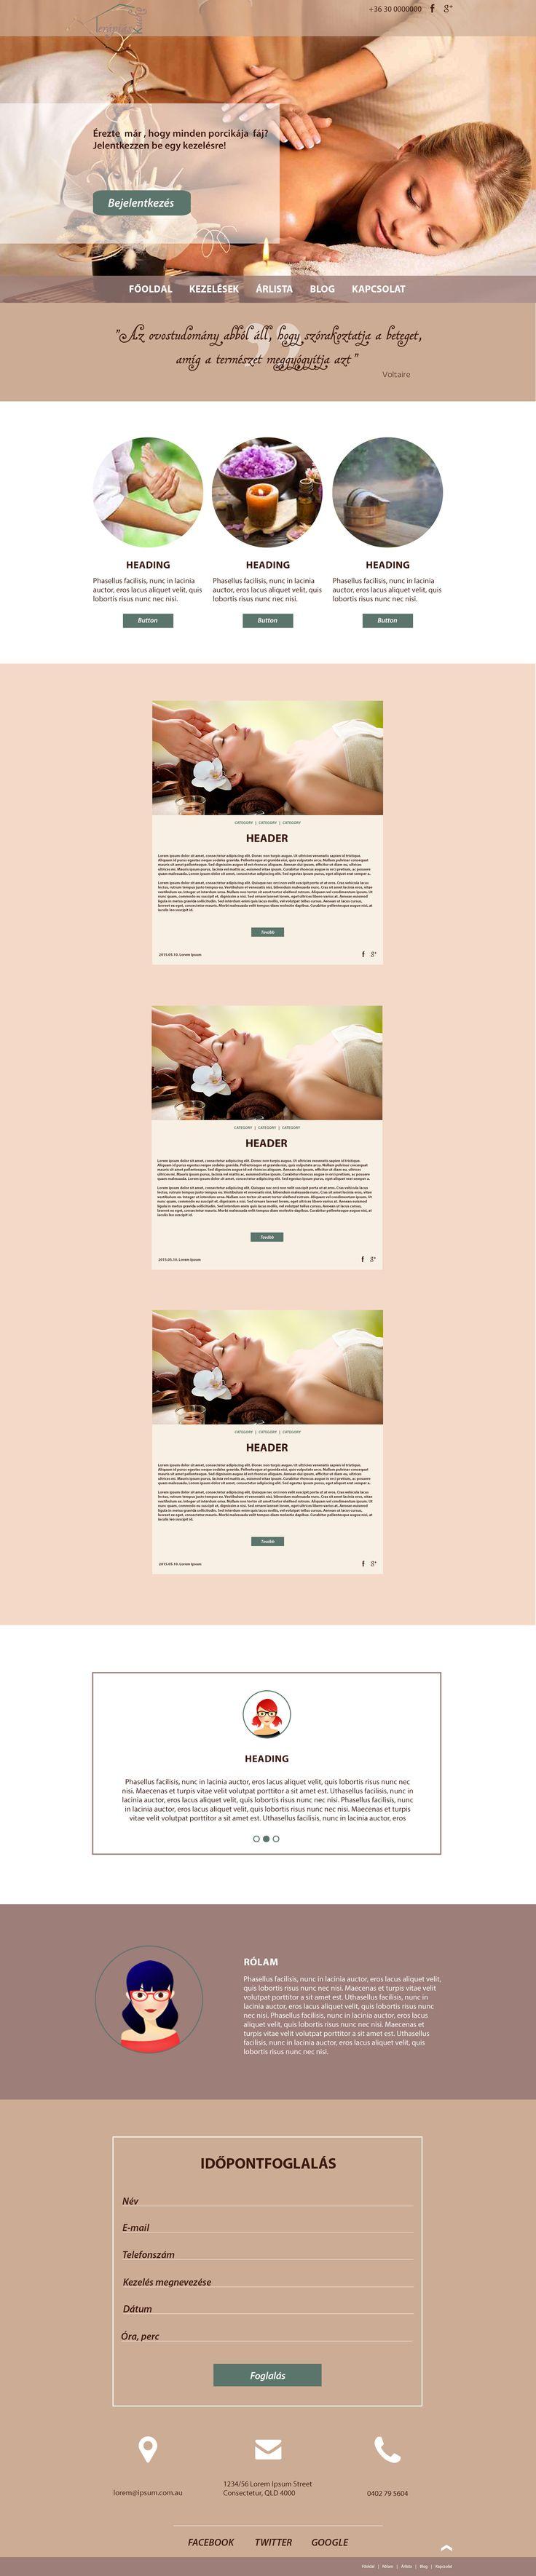 Massage salon webdesign and sitebuild  www.terapiaskucko.hu